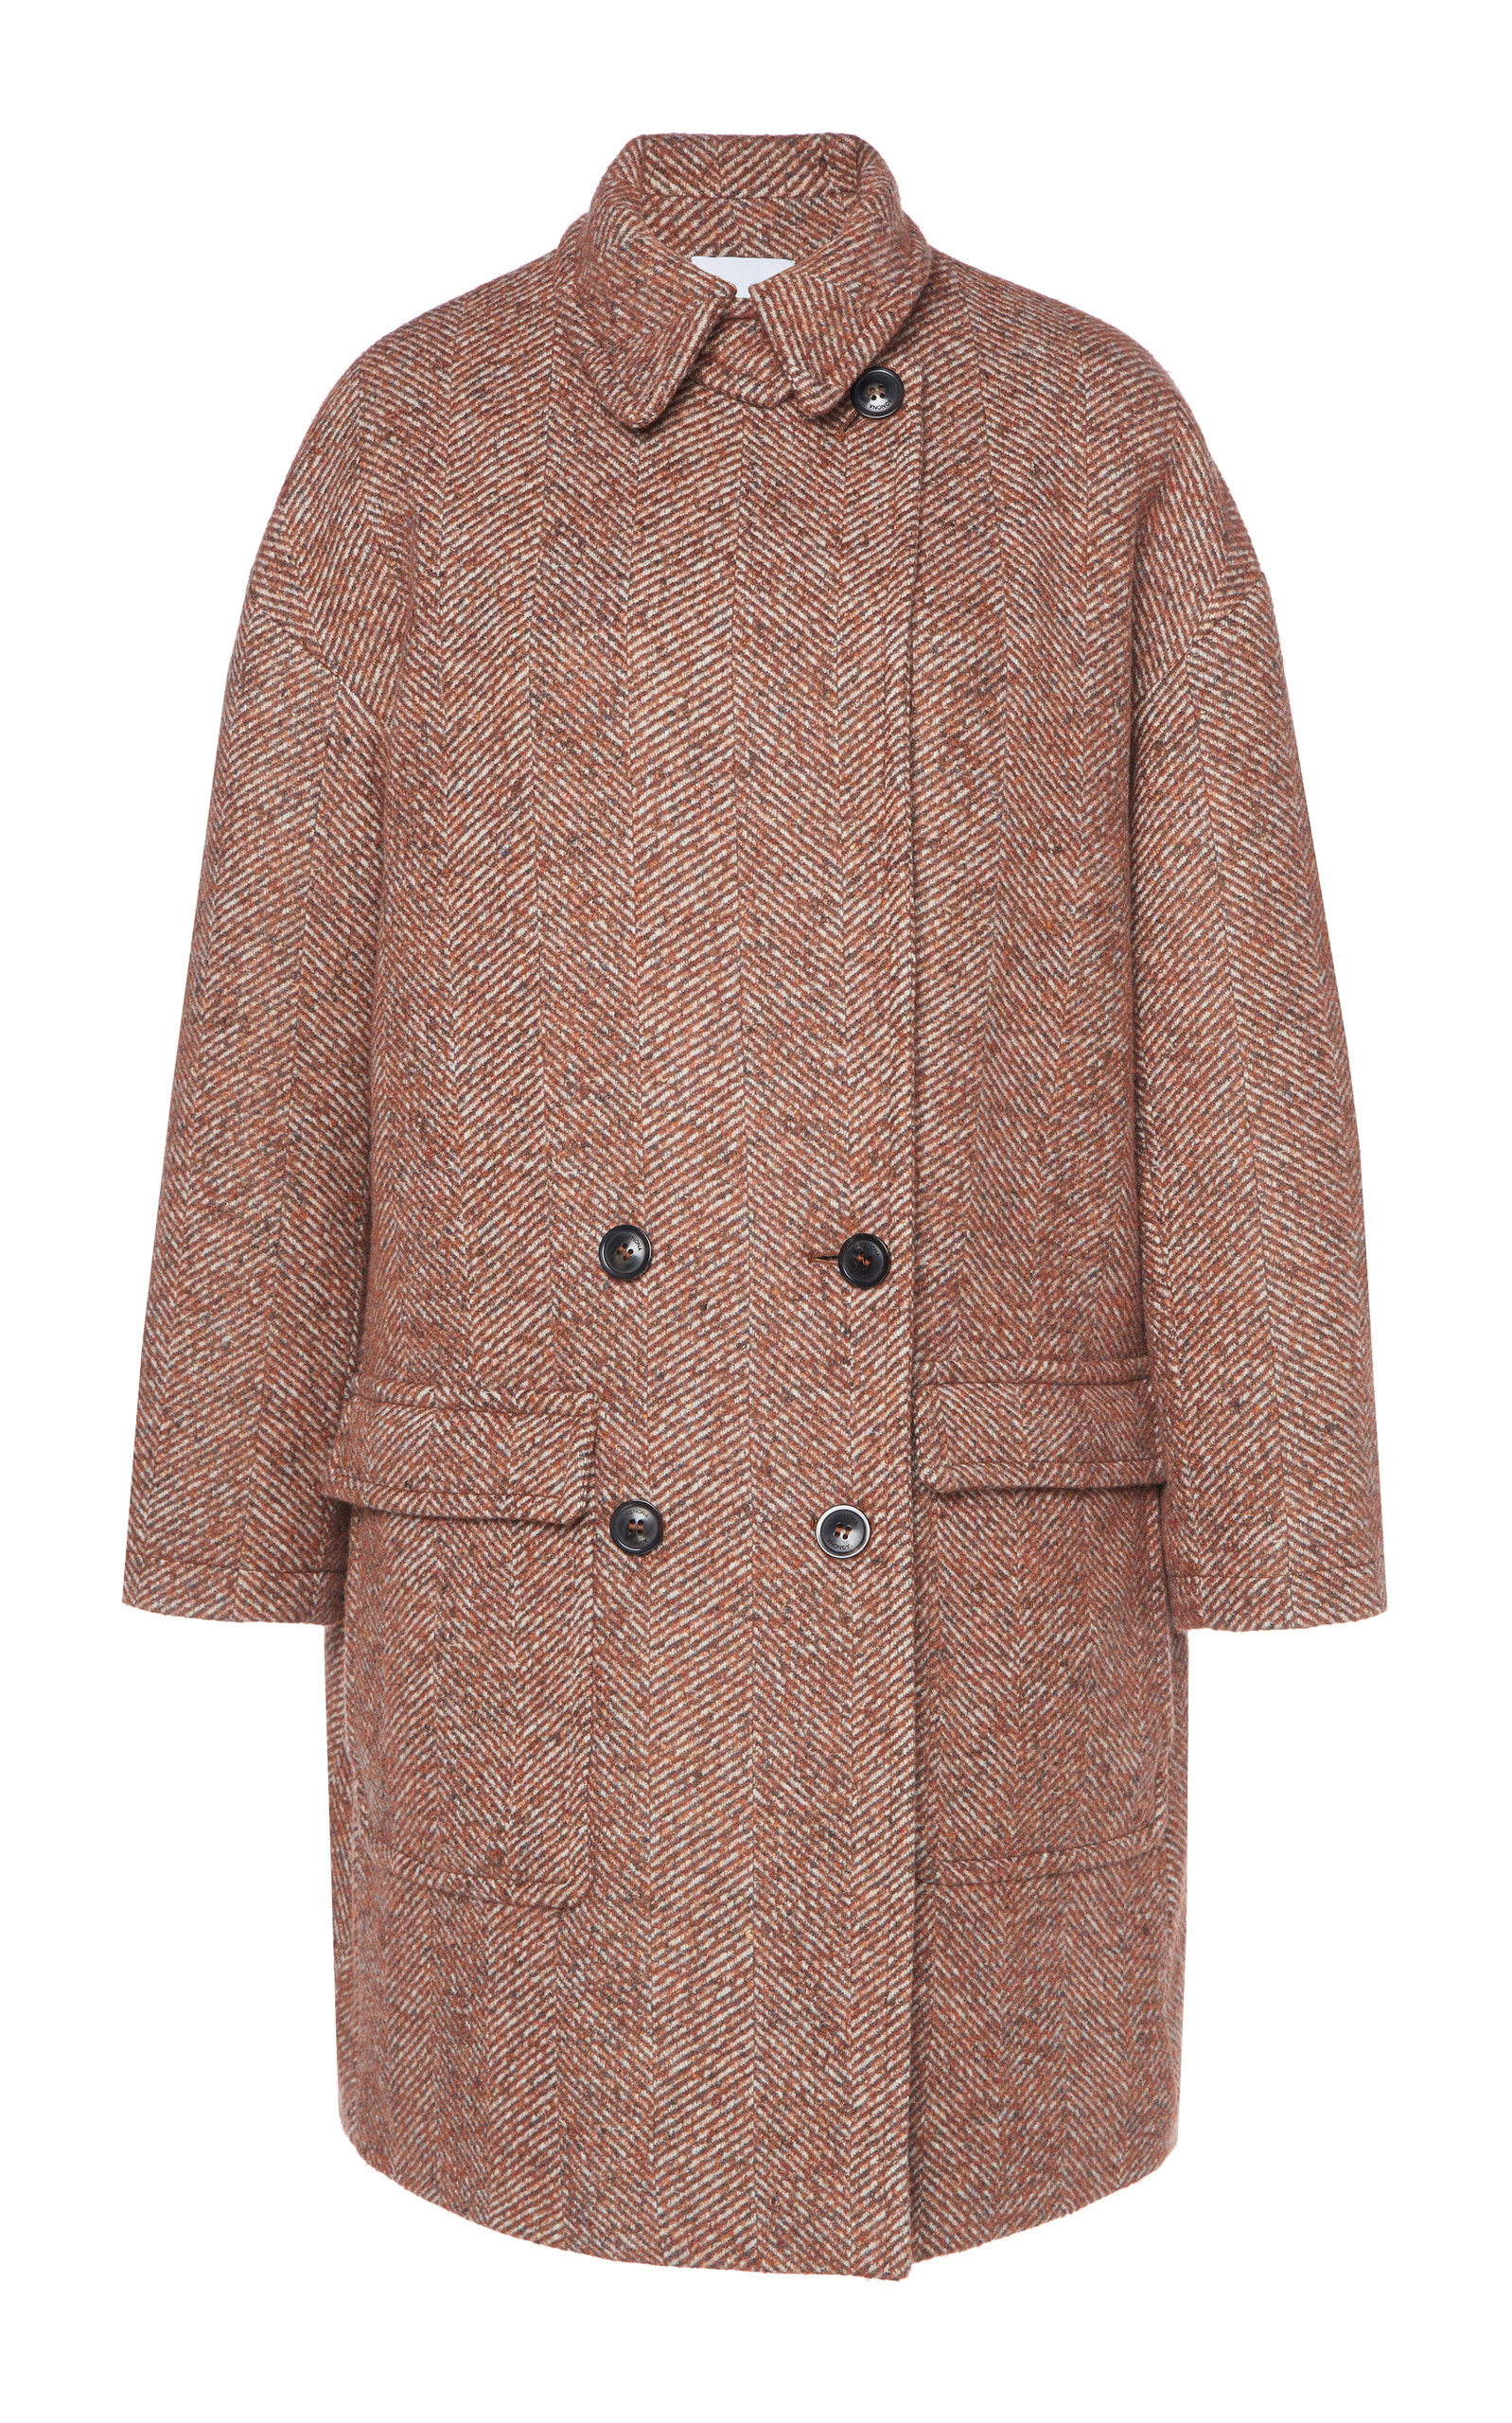 real deal discount 100% genuine Herringbone Alpaca Wool Peacoat